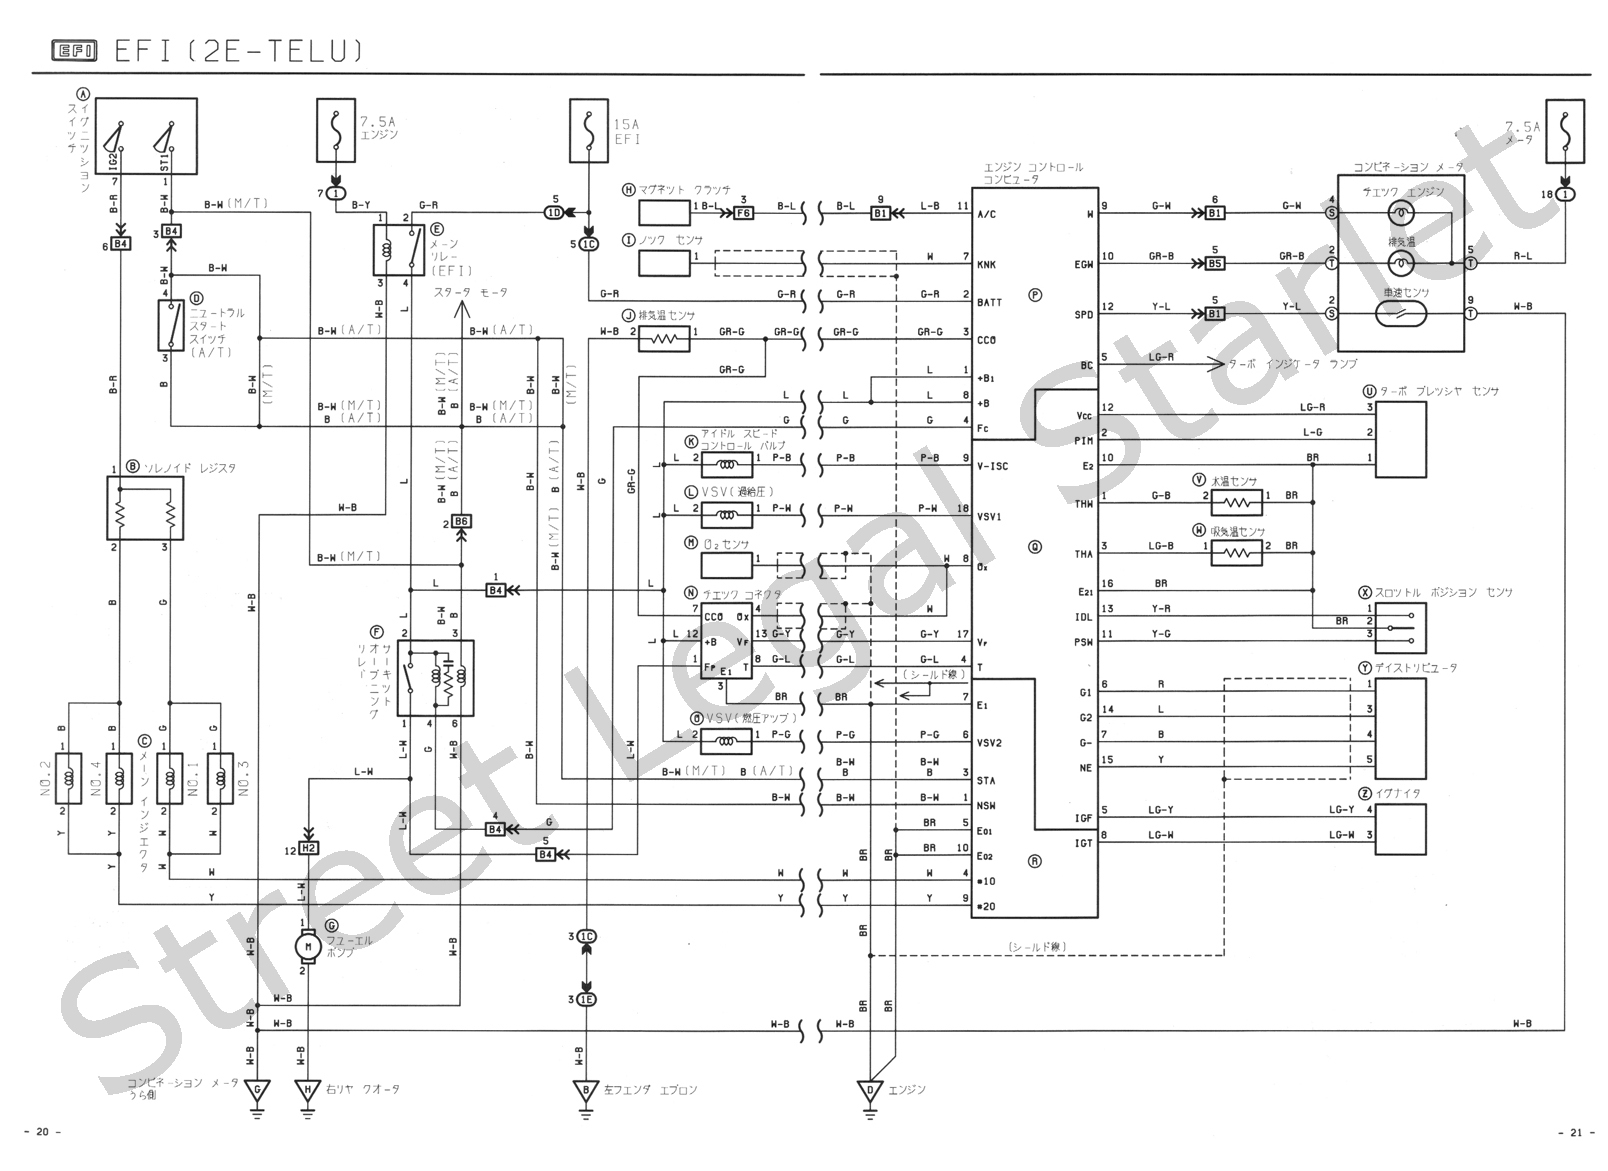 SLS EP71 Wiring diagram 2e telu?resize\\\\\\\=665%2C484 microtech lt8s wiring diagram snatch block diagrams \u2022 wiring becker europa wiring diagram at fashall.co